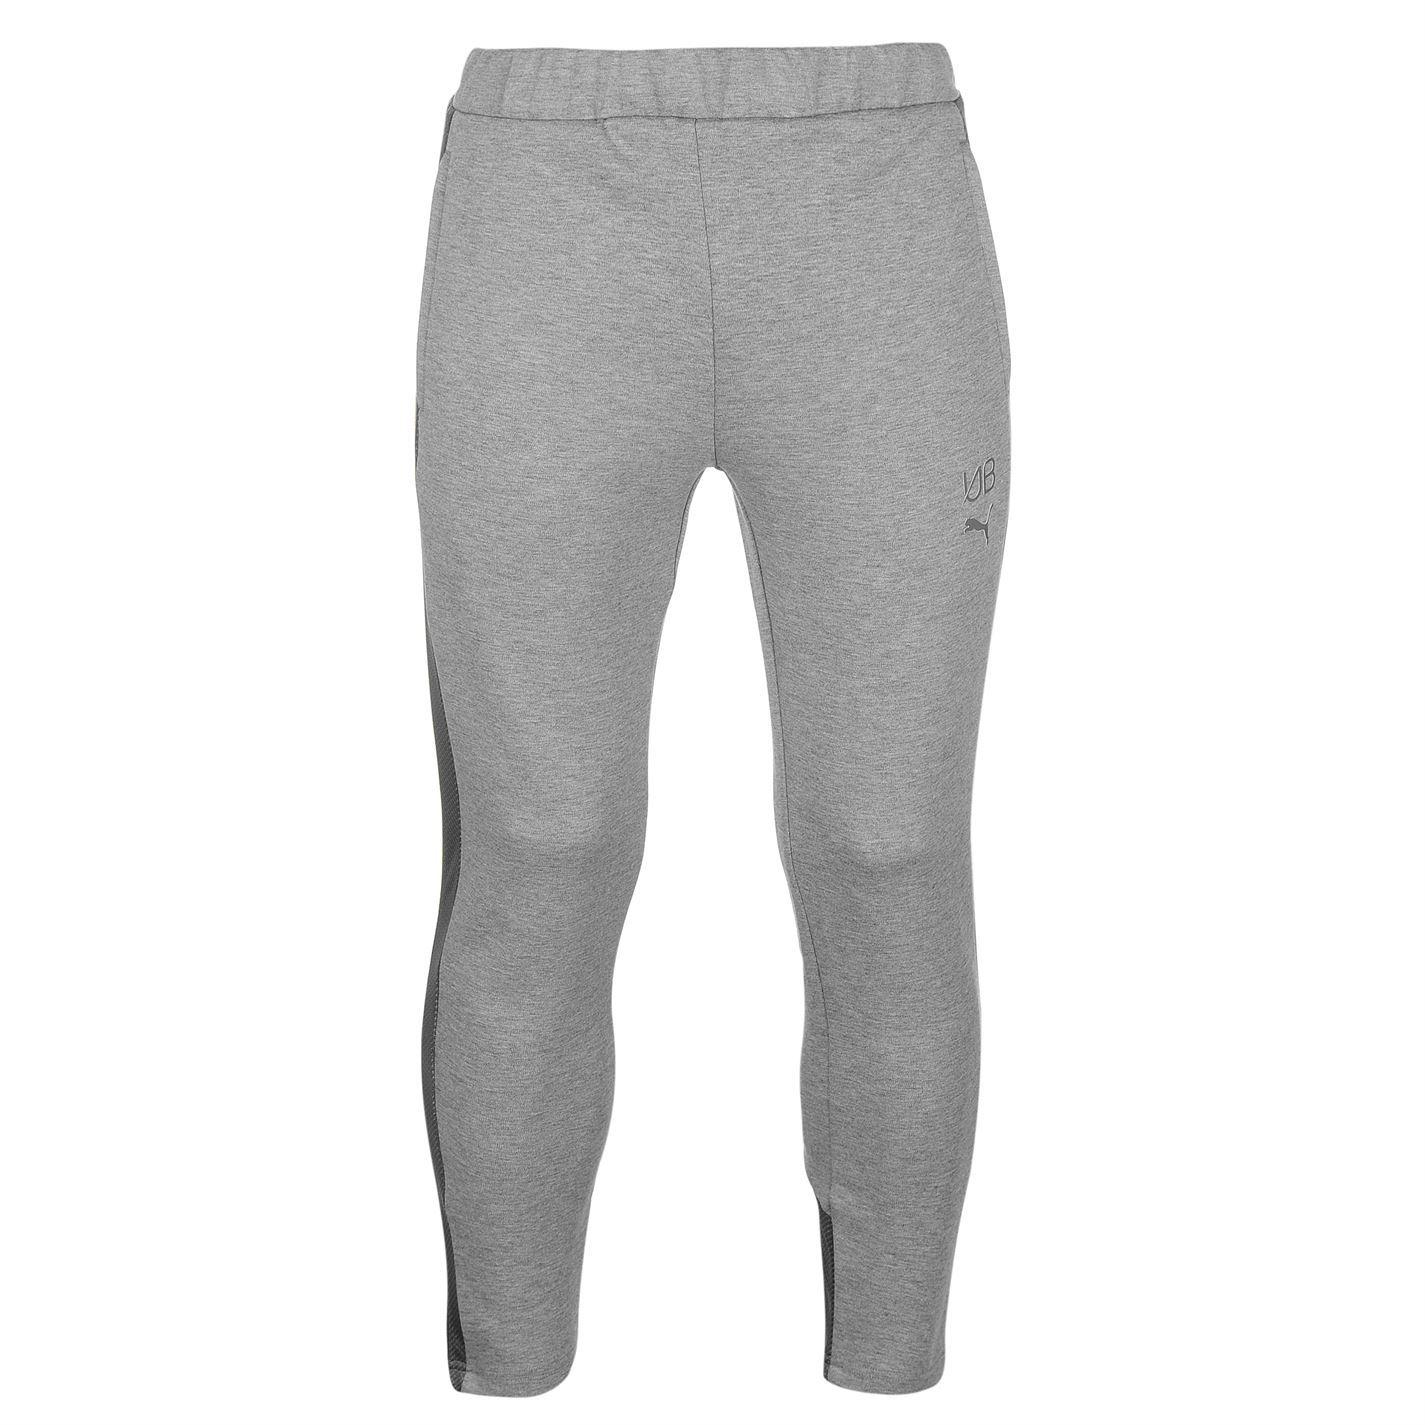 08cb36a28b05 Puma Mens Usain Bolt Tracksuit Bottoms Fleece Jogging Trousers Pants Zip  Mesh